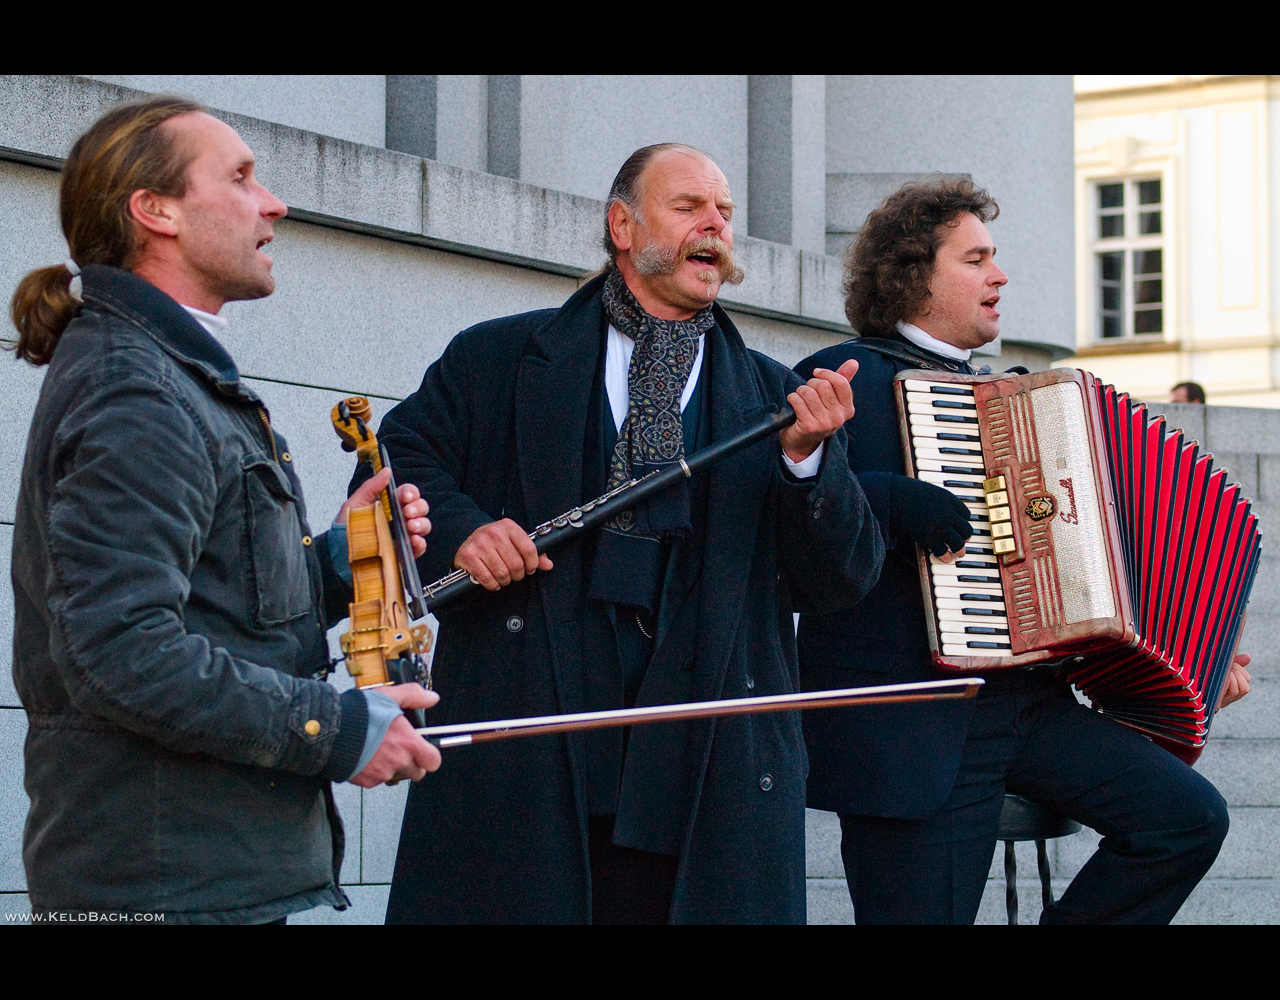 Street Music by KeldBach